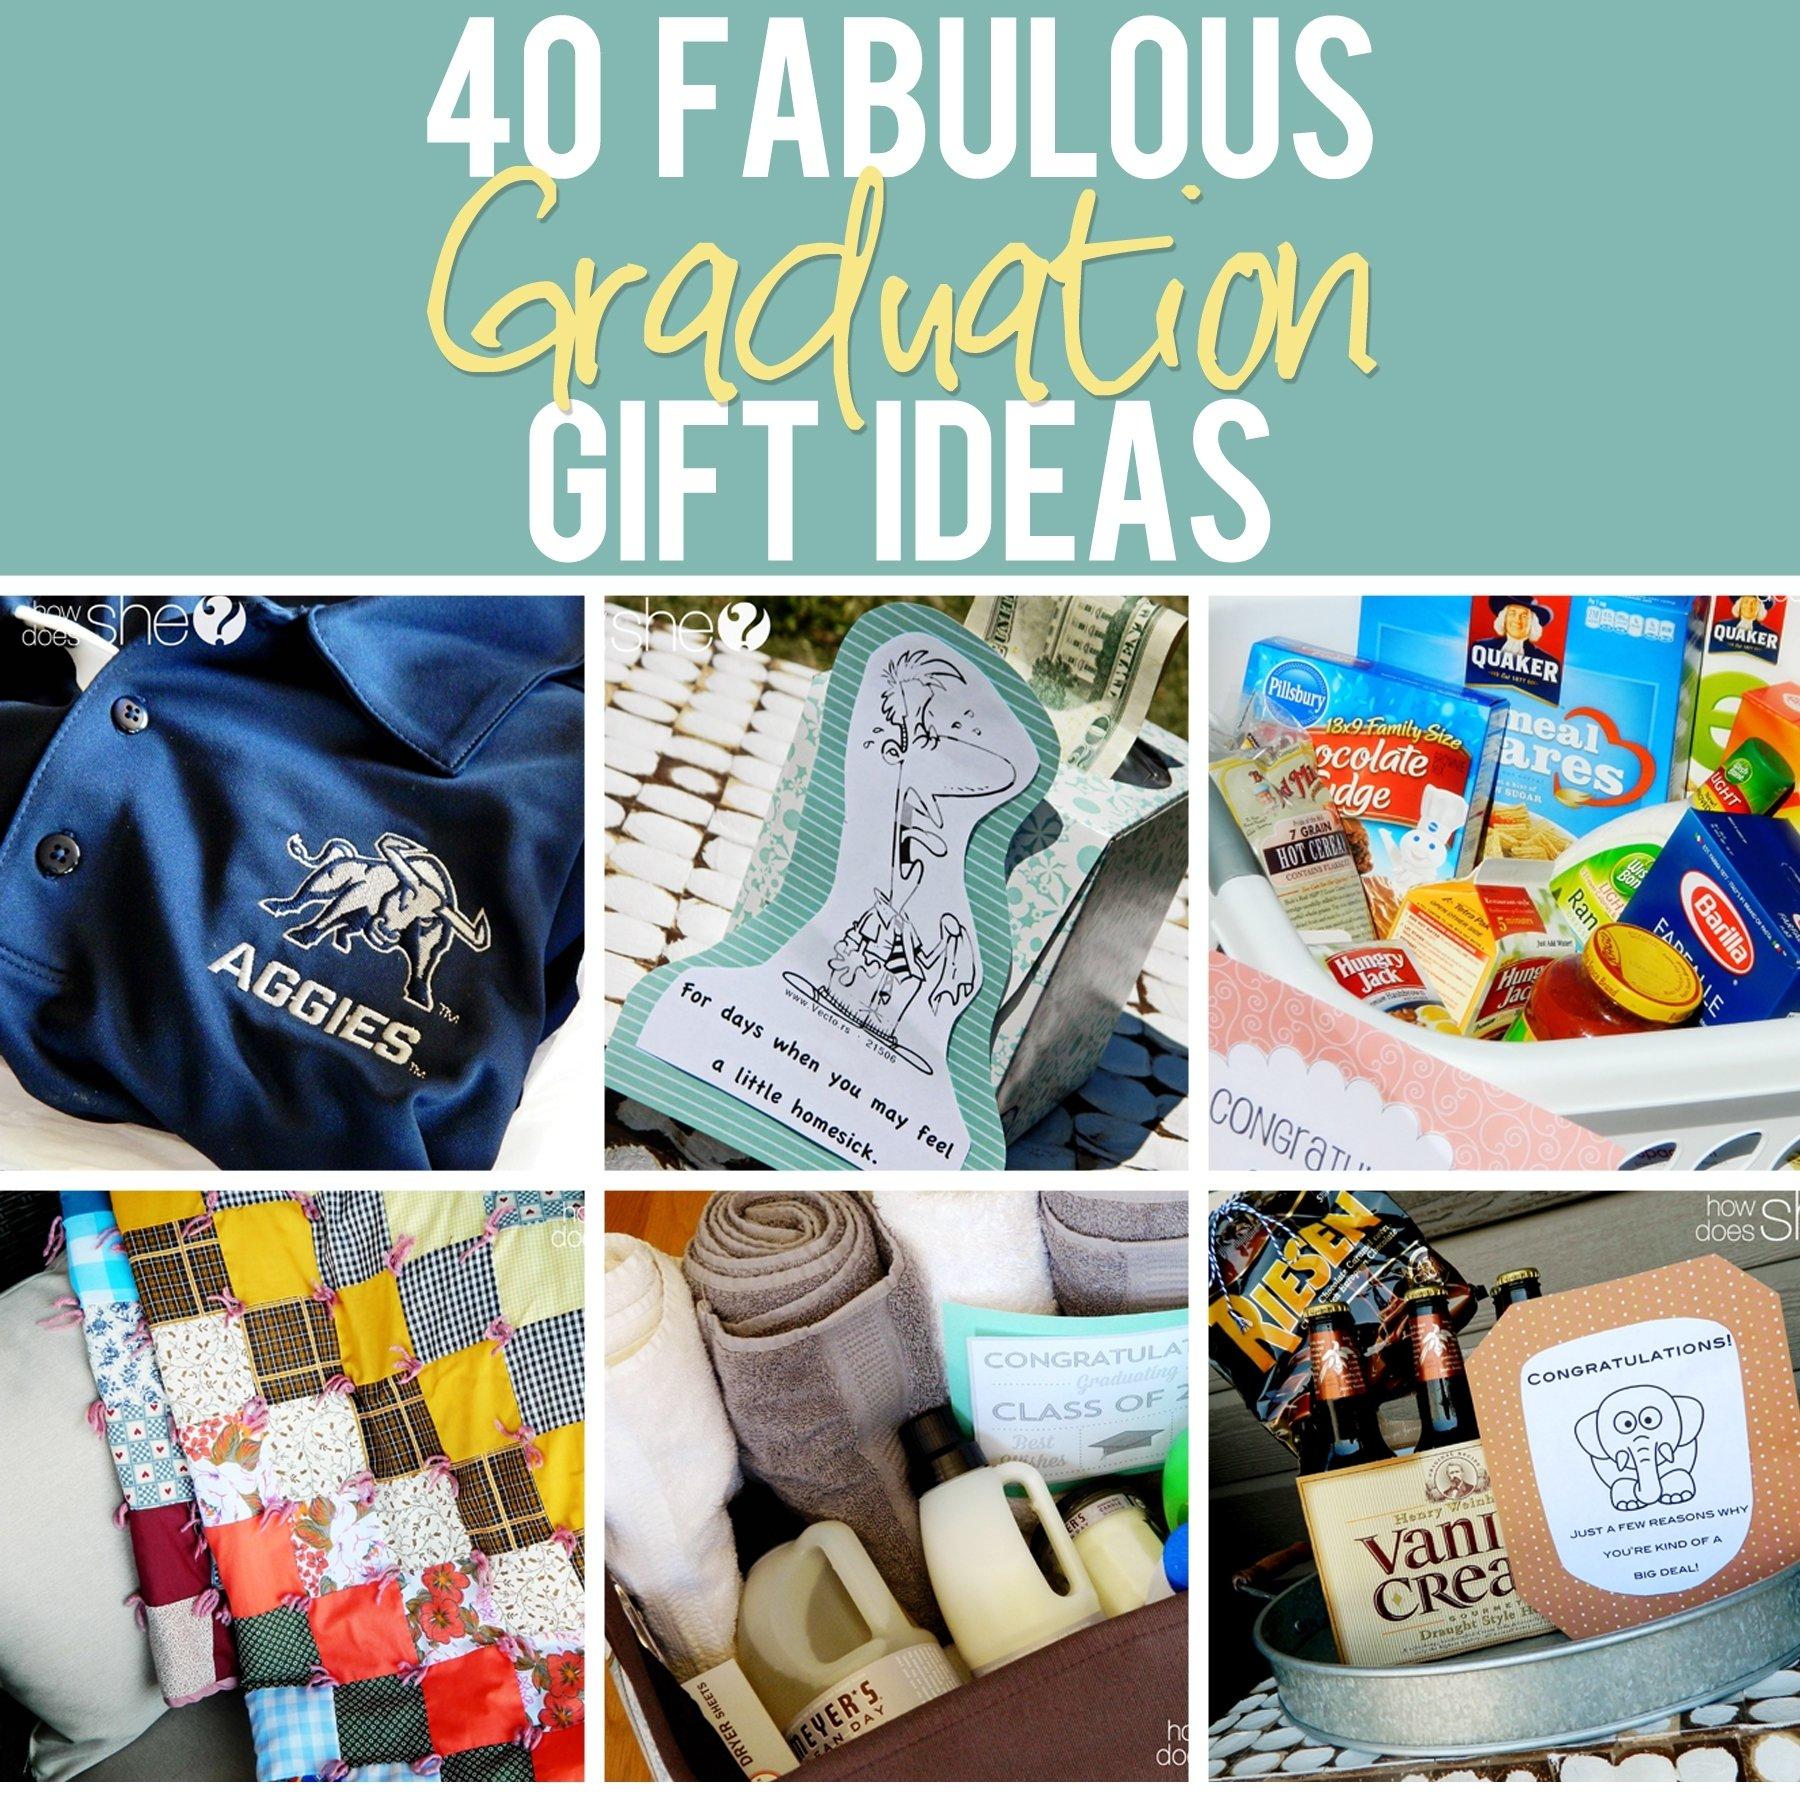 10 Amazing Graduation Gift Ideas For Best Friend graduation gift ideas that are perfect for any graduate 3 2021